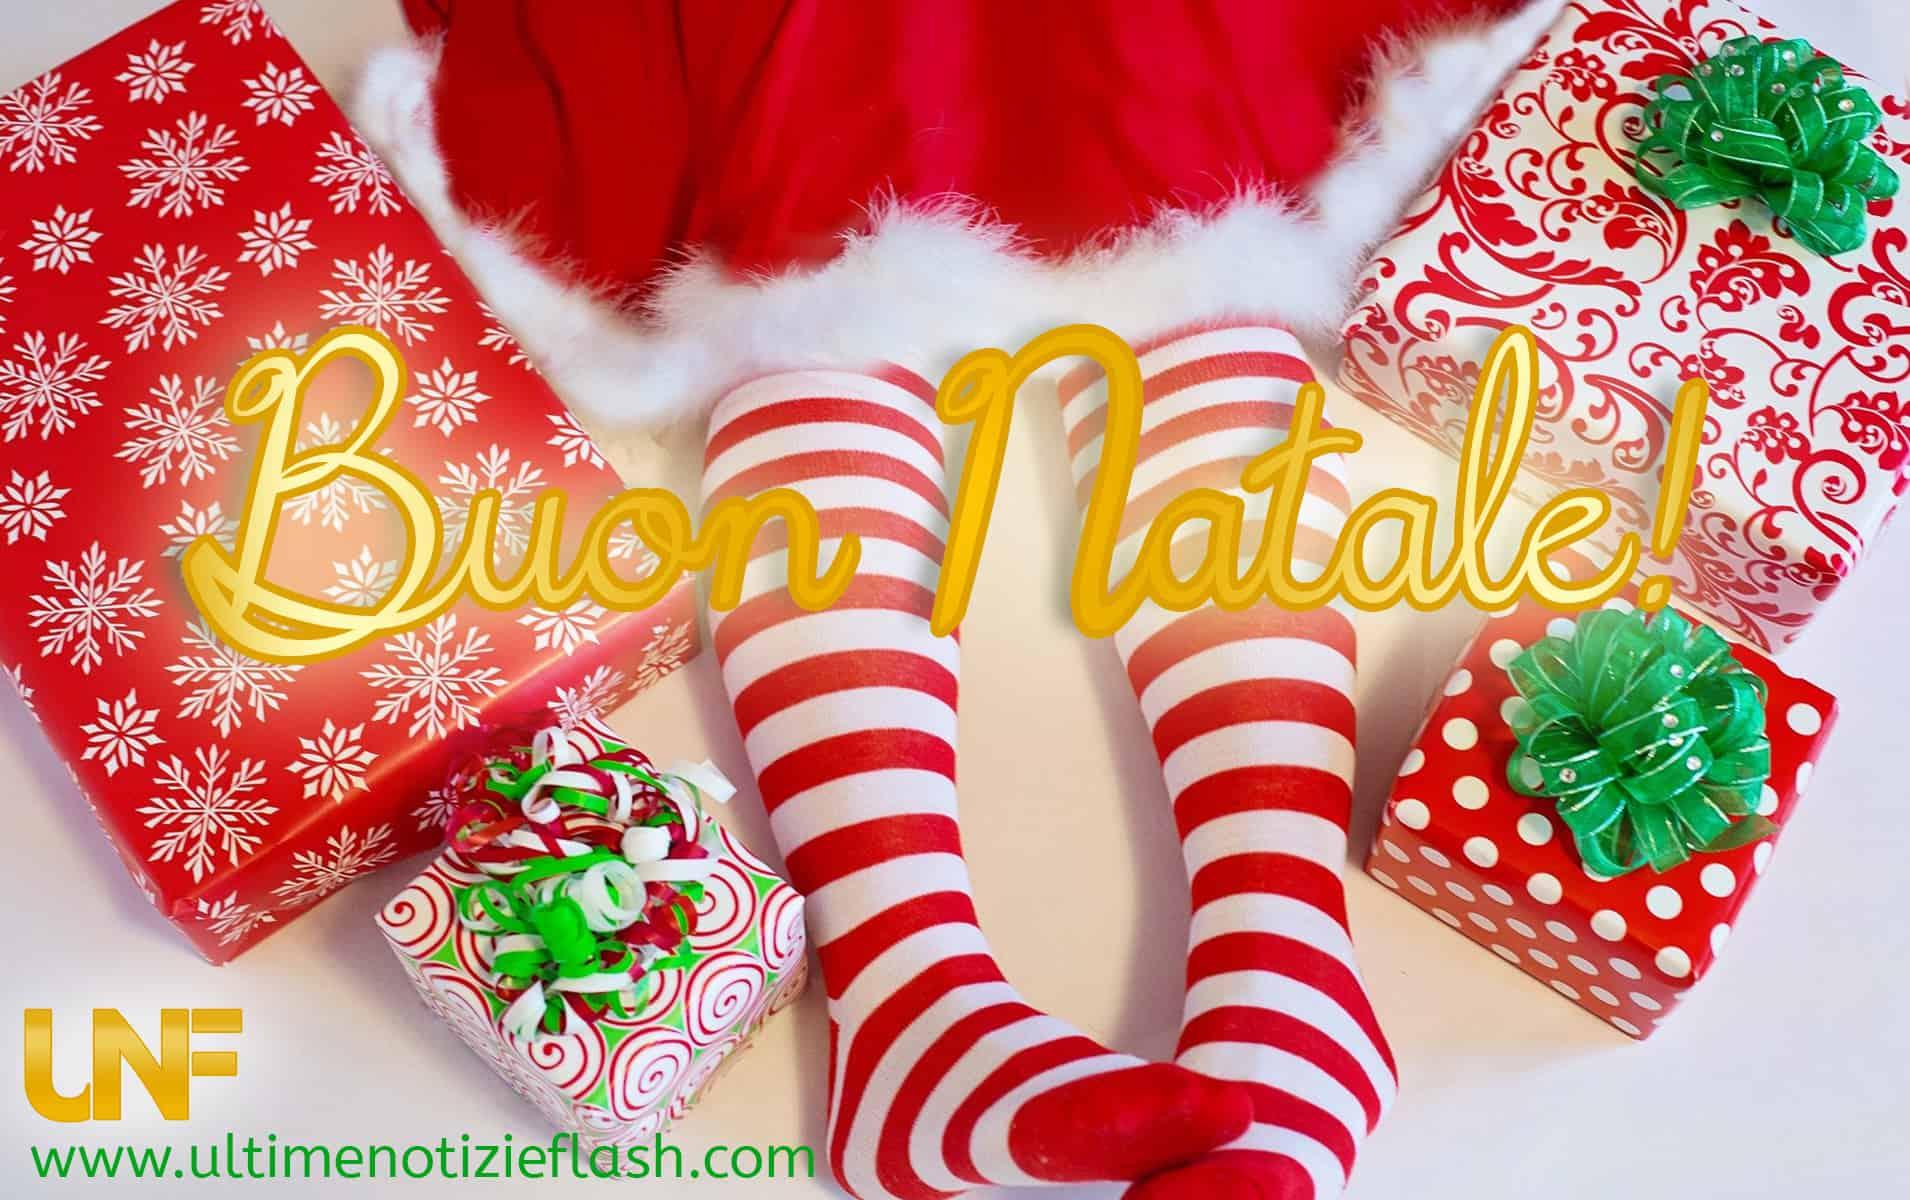 Le immagini più belle da mandare a Natale da Whatsapp a Facebook